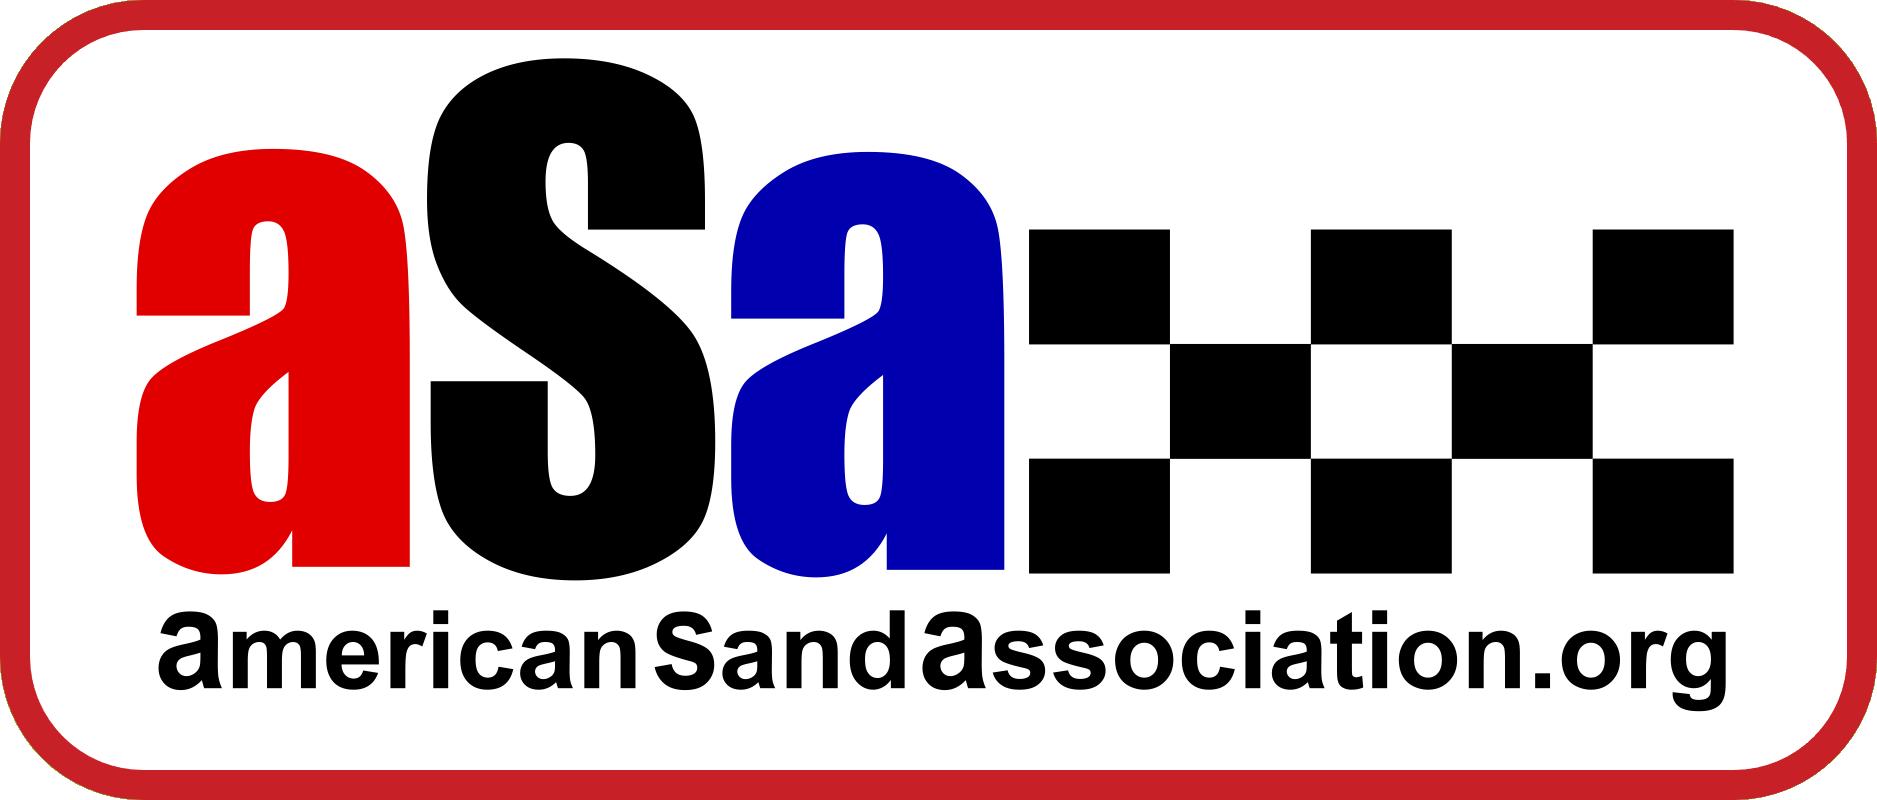 American Sand Association